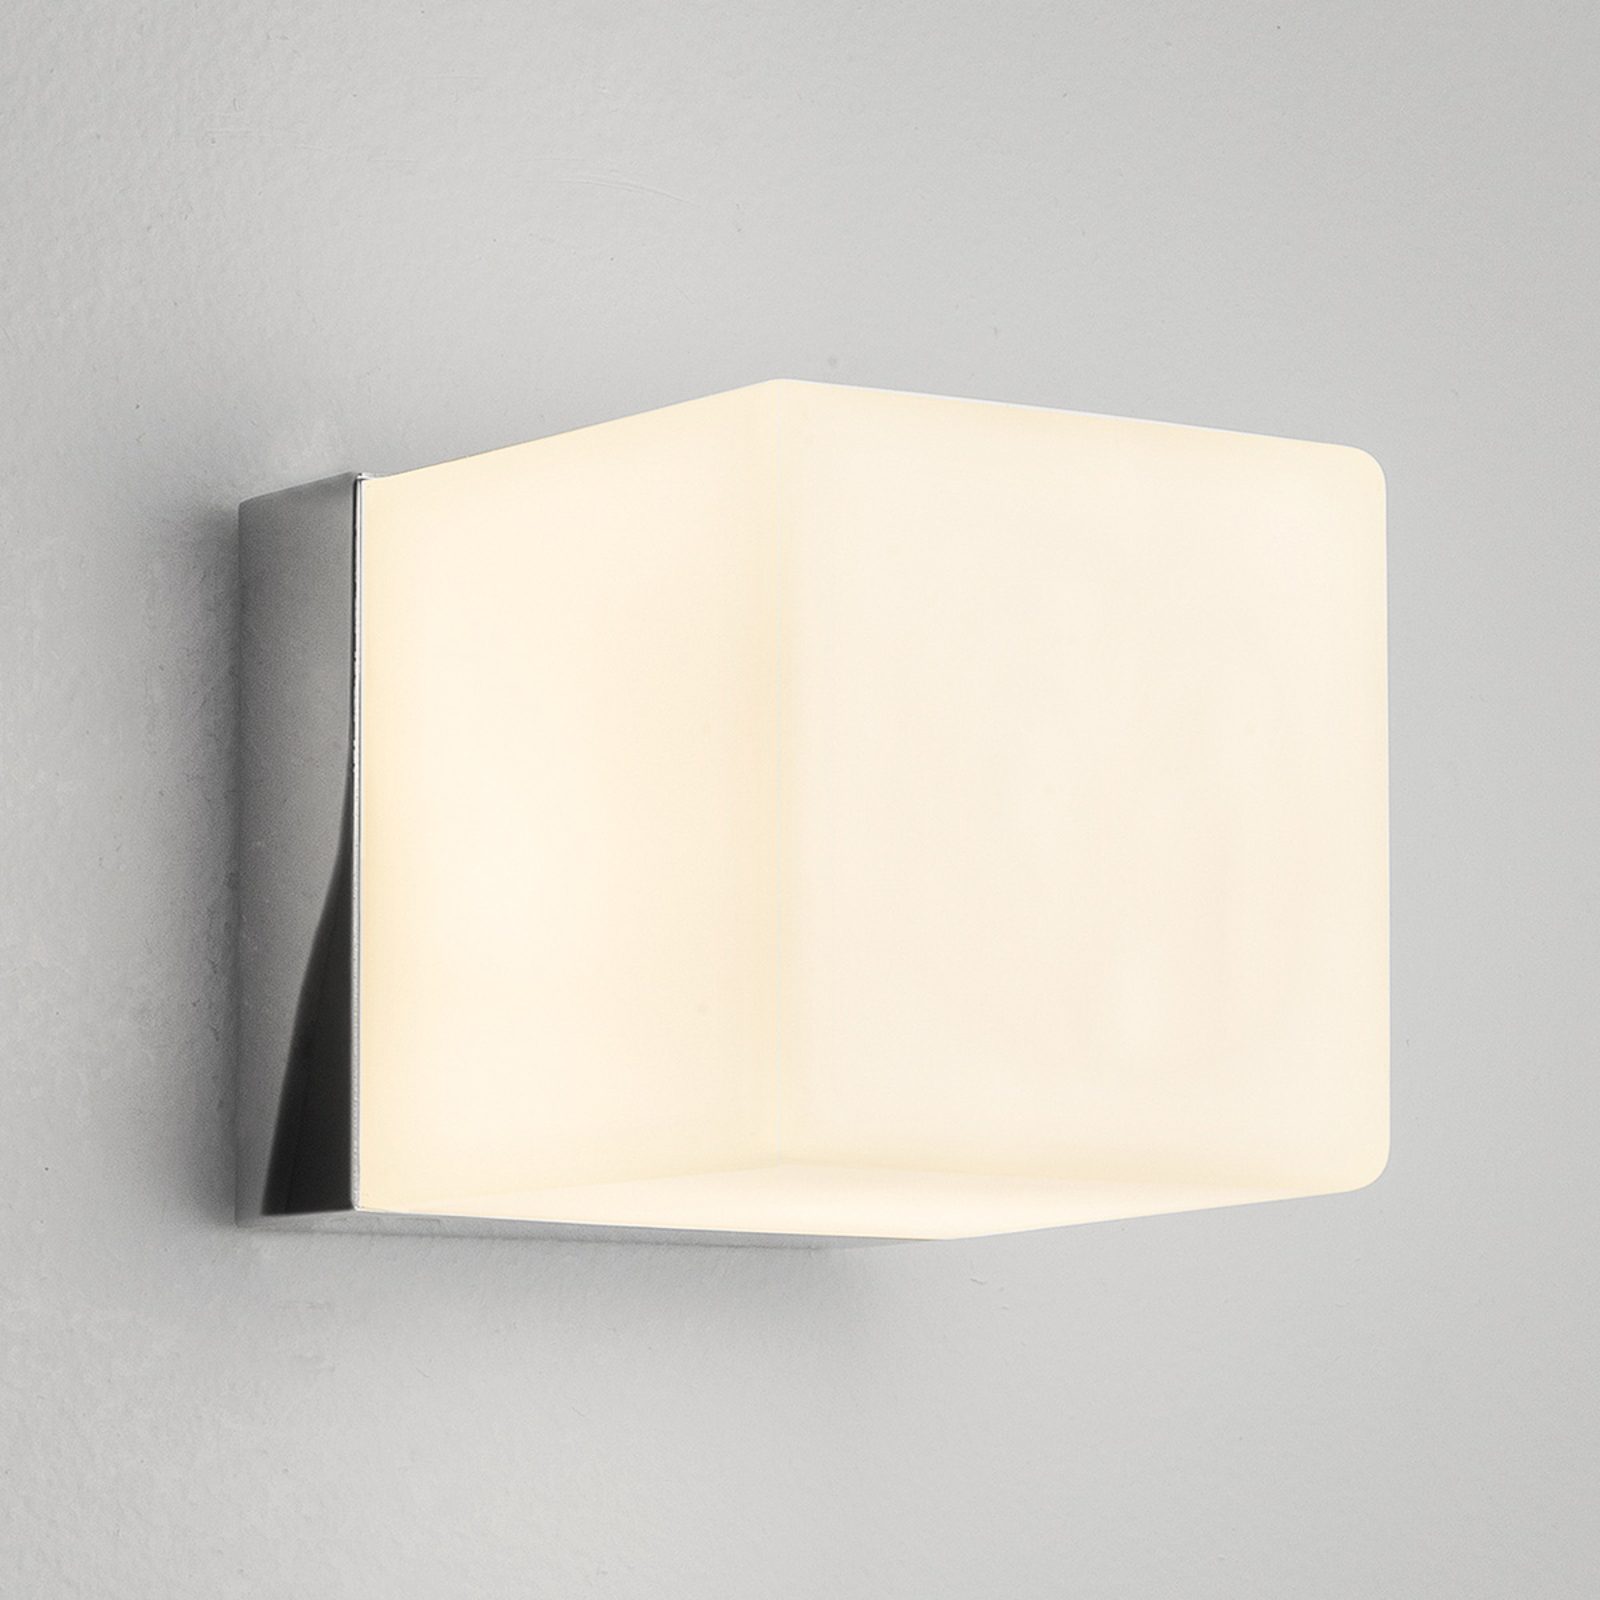 Decente wandlamp CUBE